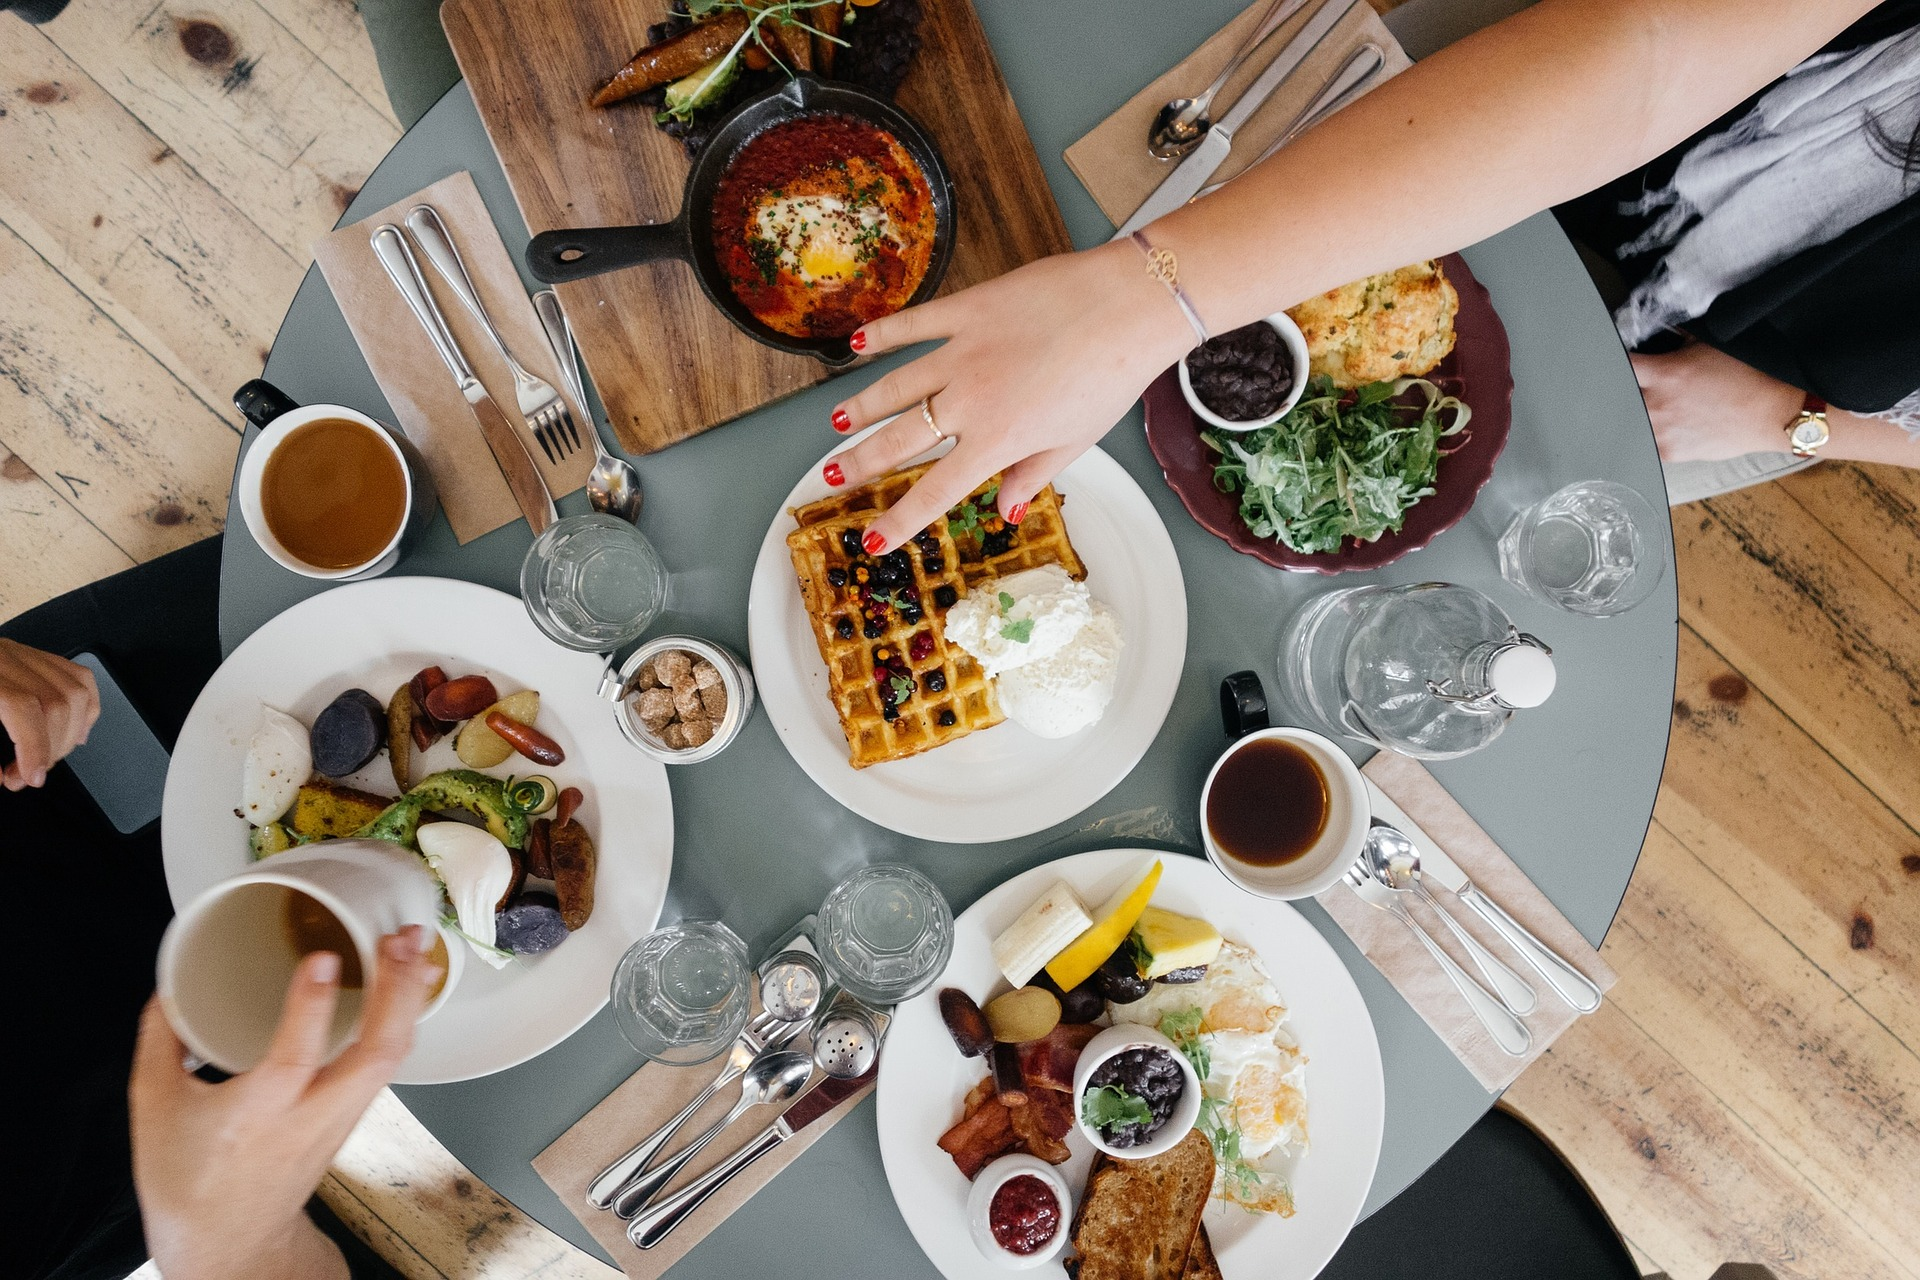 The 10 Best Restaurants in Sotogrande According to TripAdvisor